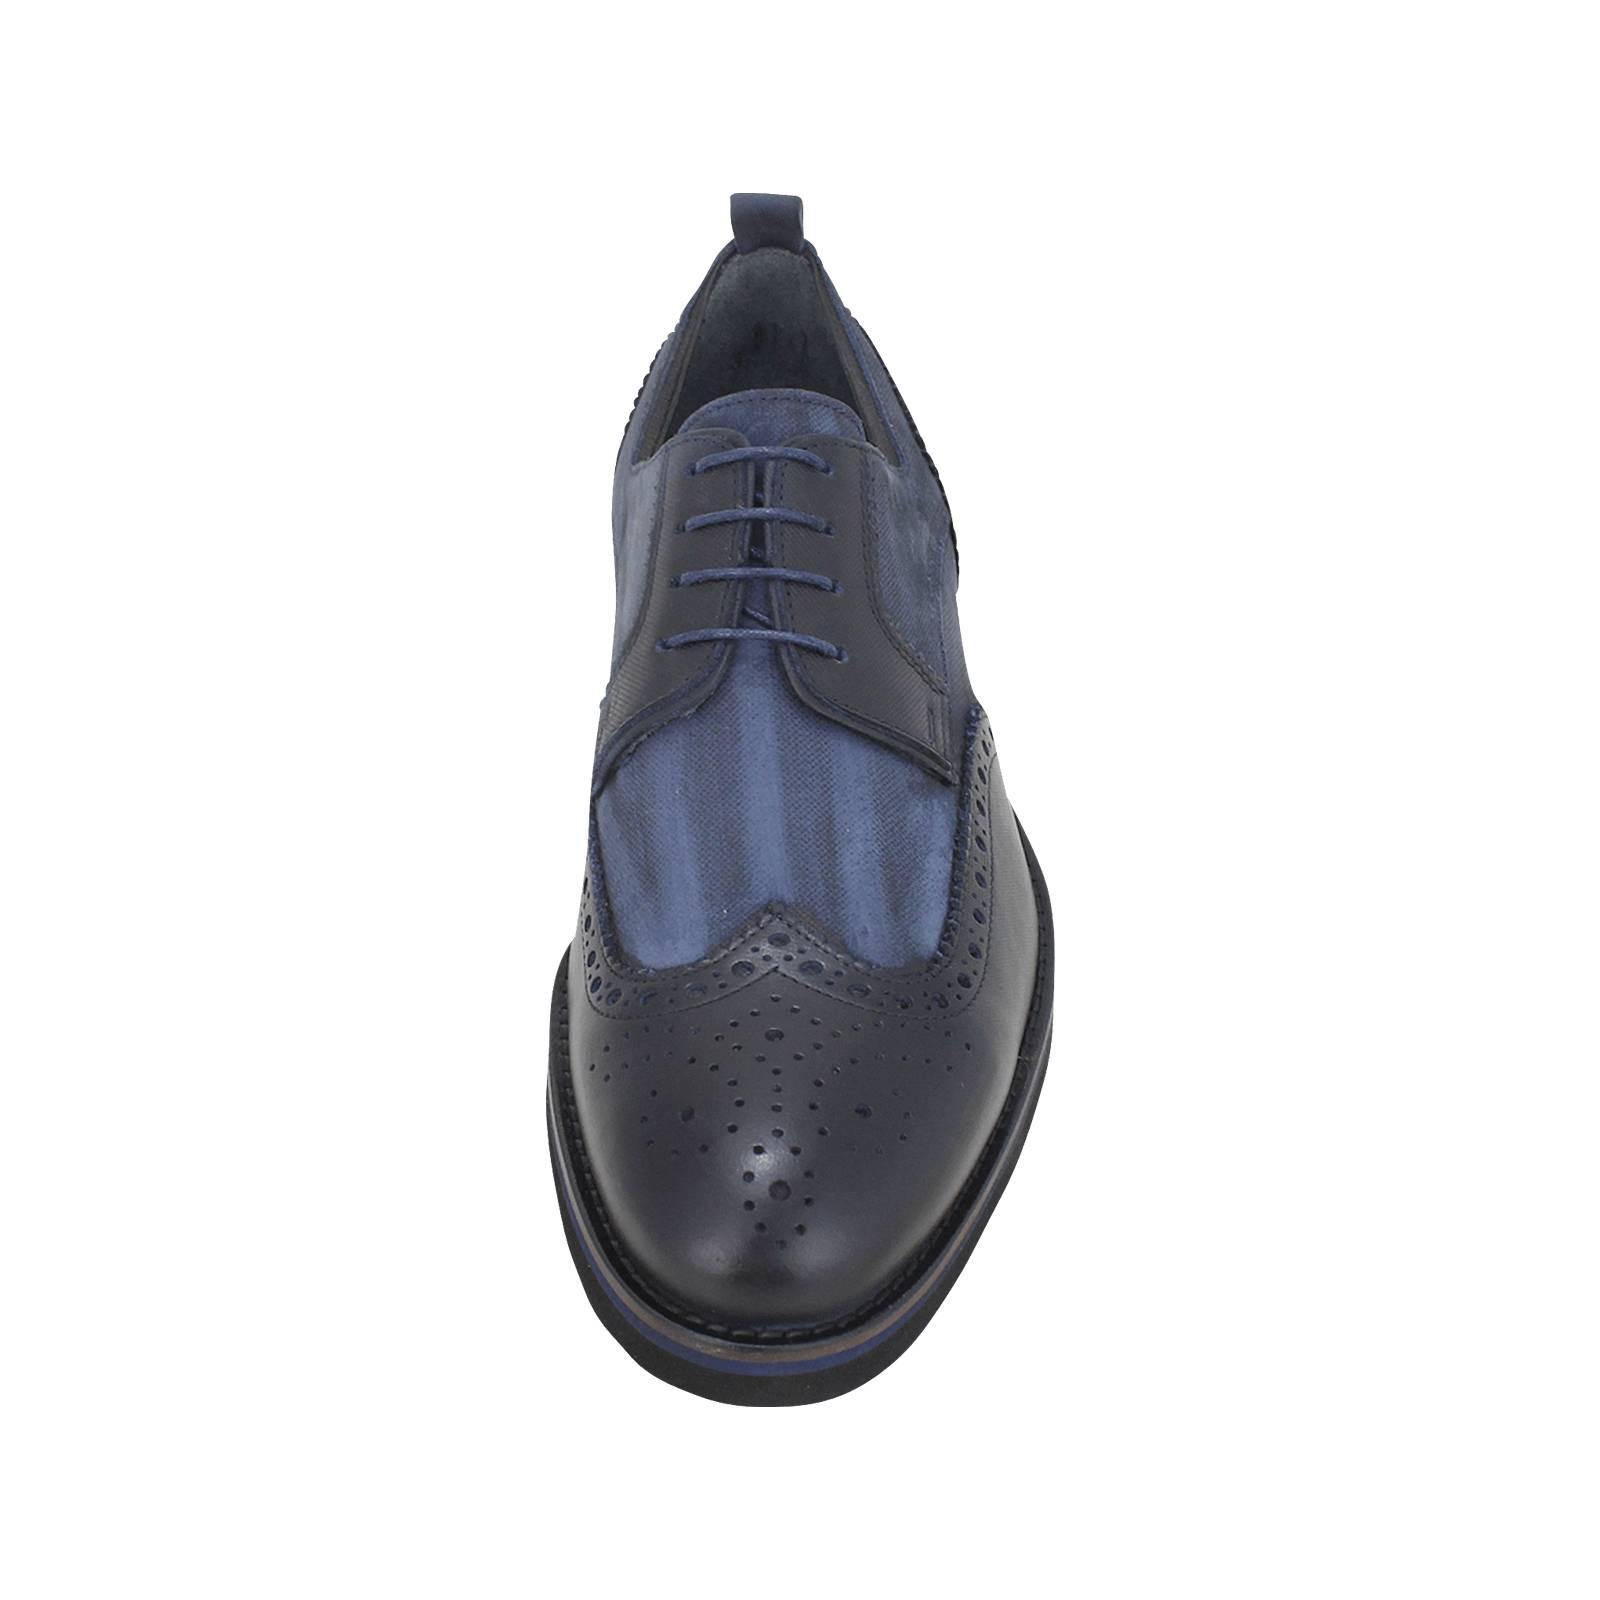 Sierling - Ανδρικά δετά παπούτσια GK Uomo από δερμα και λαστιχο ... 166f53e635e